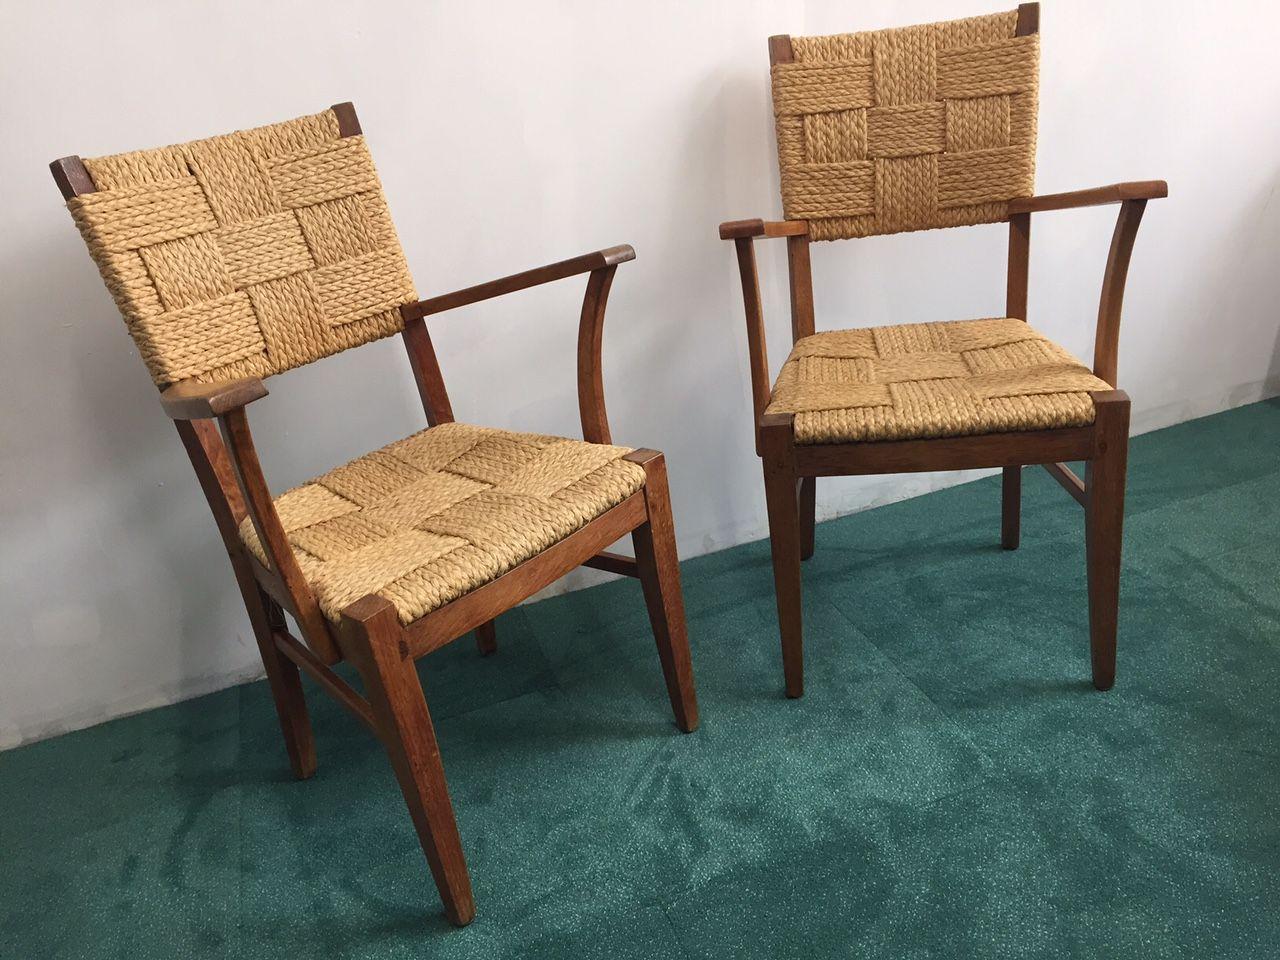 vintage st hle von audoux minet 2er set bei pamono kaufen. Black Bedroom Furniture Sets. Home Design Ideas